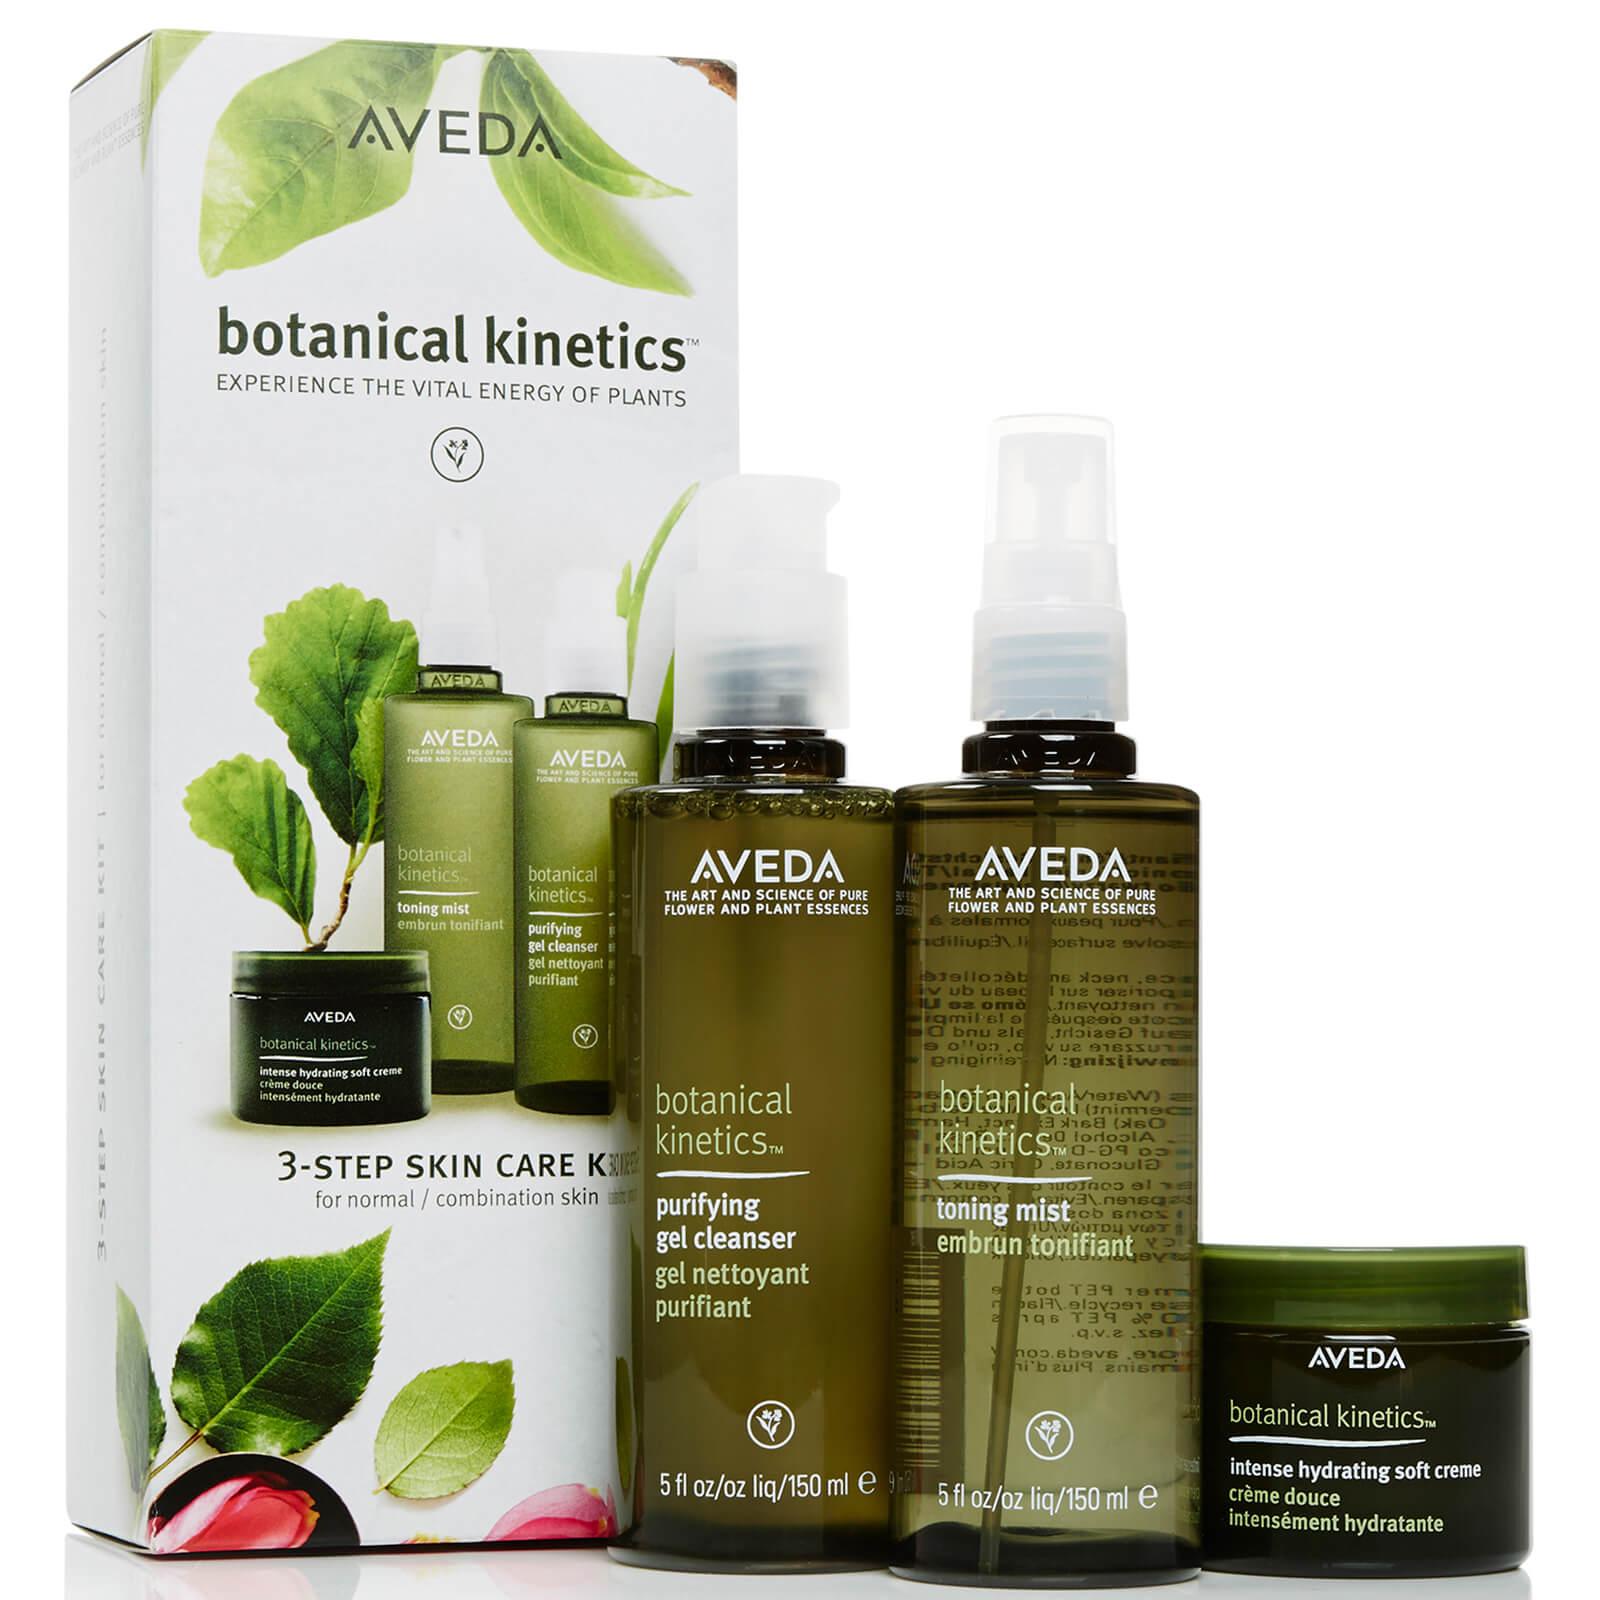 Aveda Skin Care Gift Set (Worth £71). Description  sc 1 st  Lookfantastic & Aveda Skin Care Gift Set (Worth £71)   Free Shipping   Lookfantastic